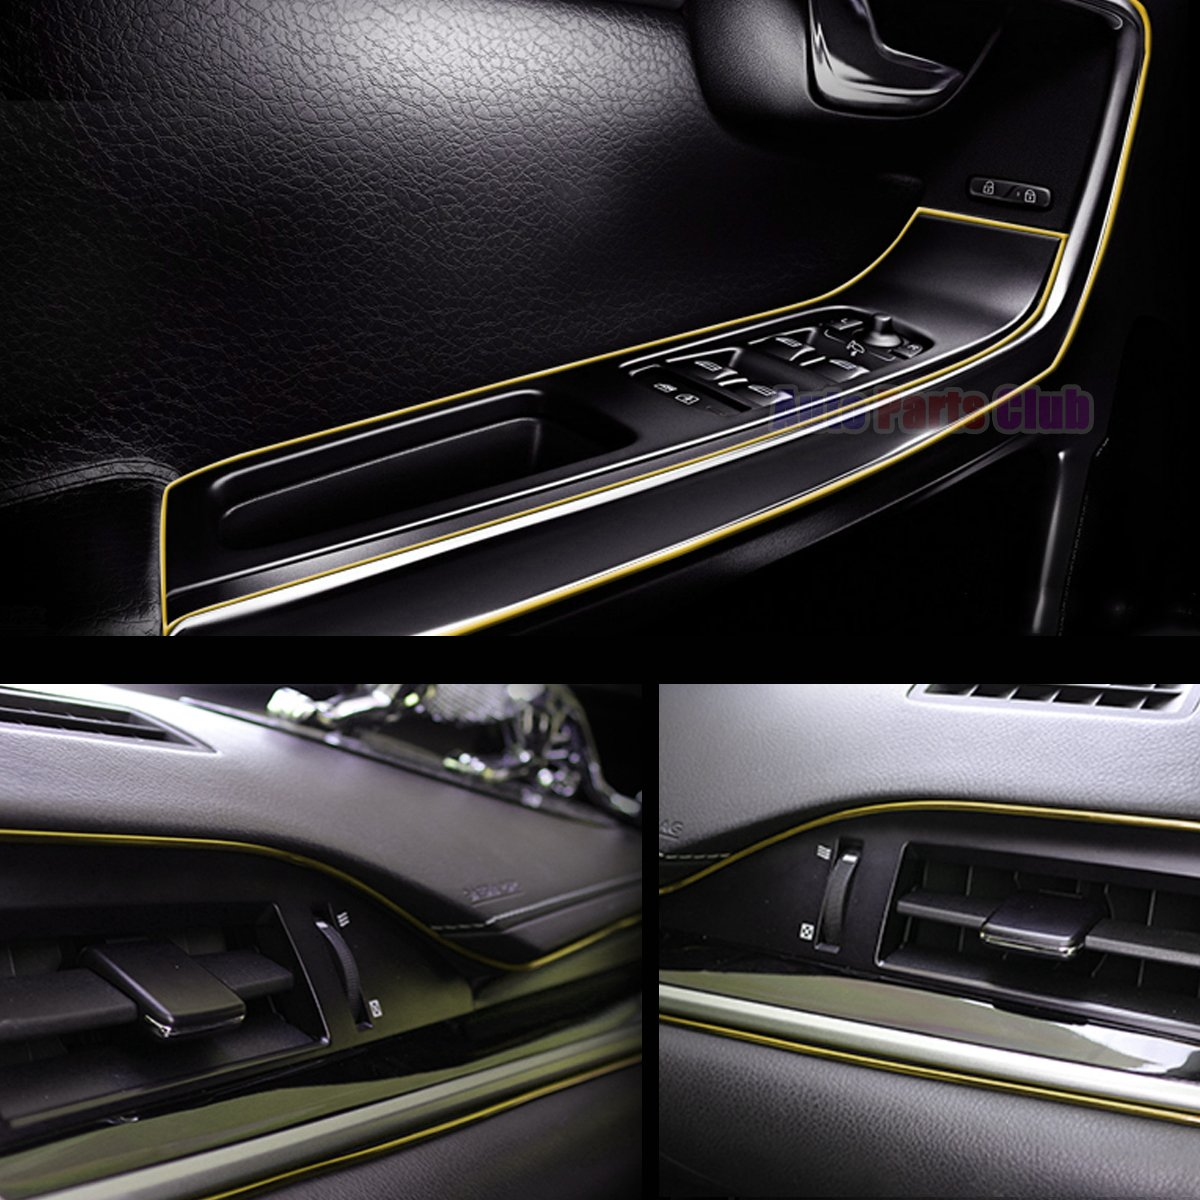 gold Car Interior Moulding Trim,3D DIY 5 Meters Electroplating Color Film Car Interior Exterior Decoration Moulding Trim Strip line by Auto Parts Club